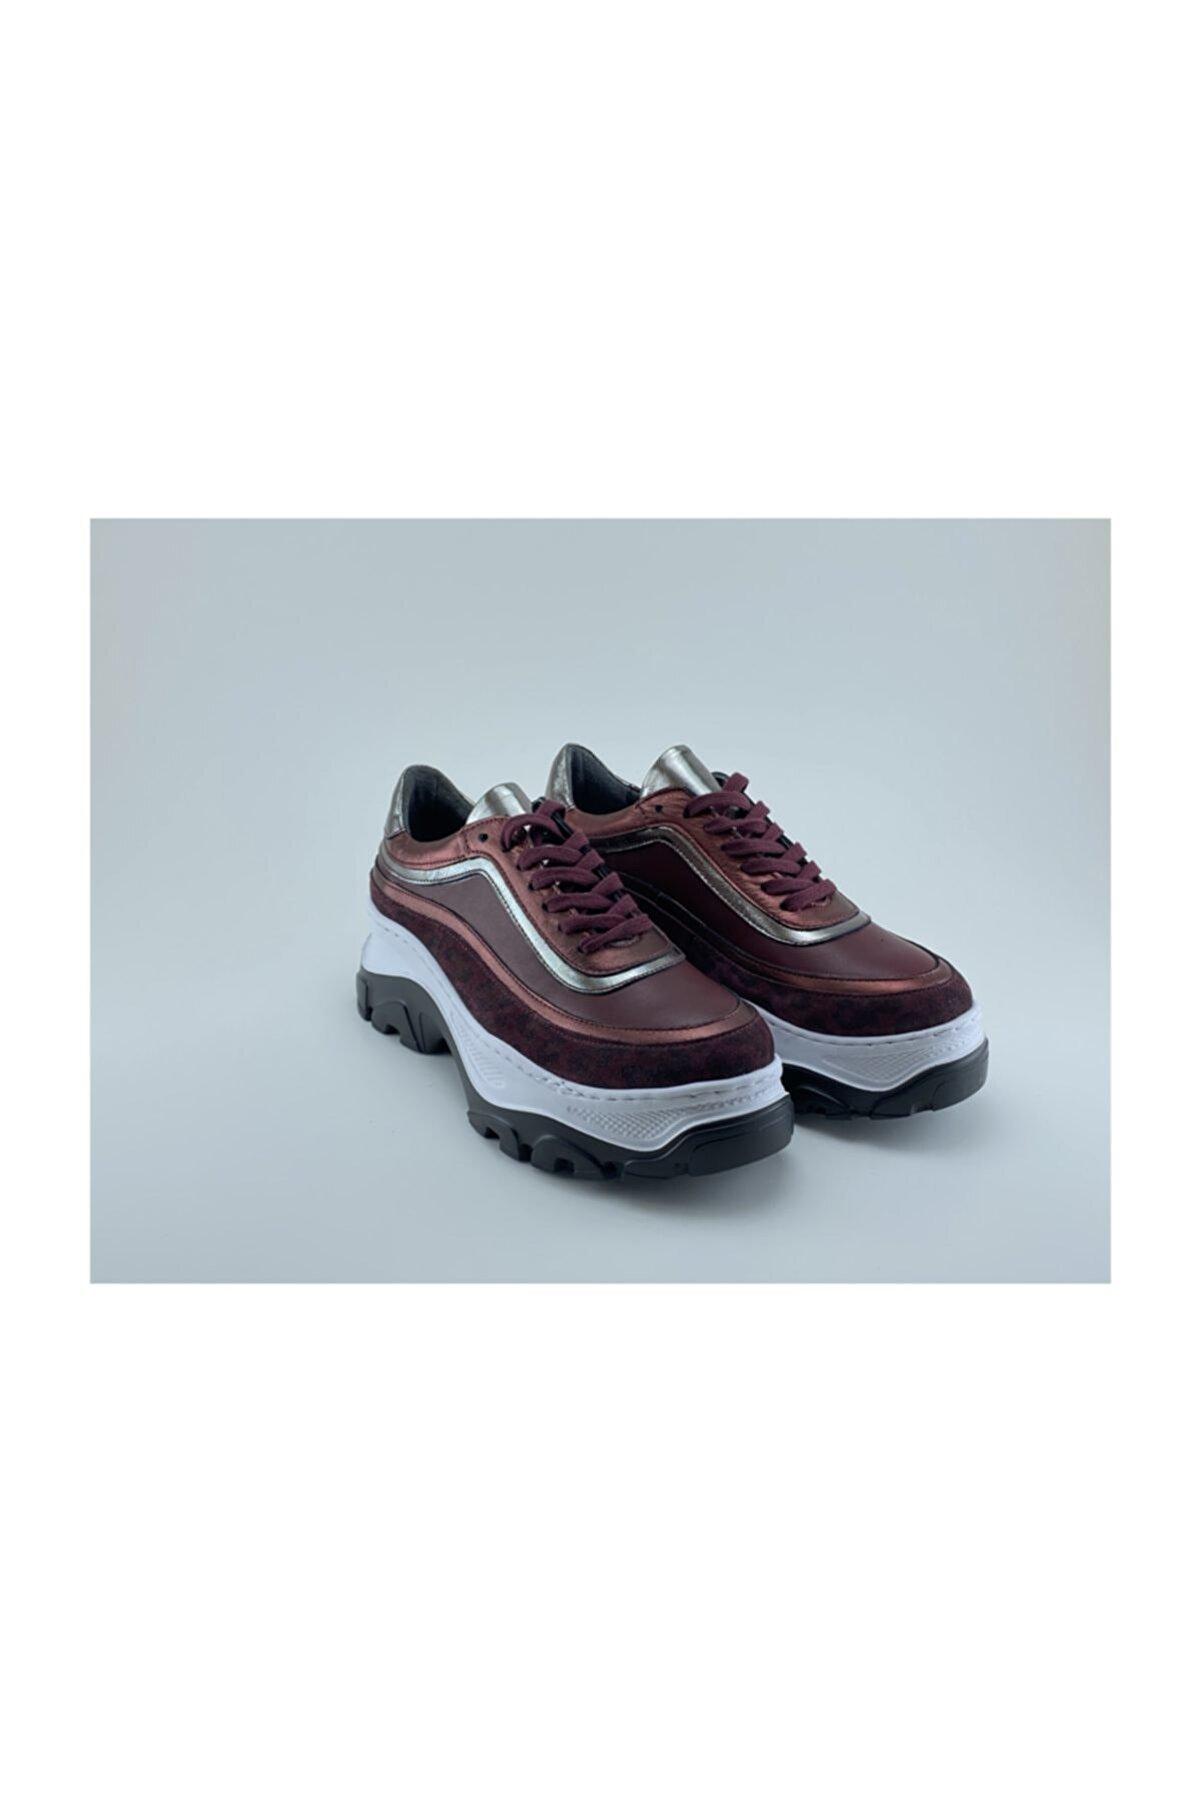 SNIPE Aquila Sneakers